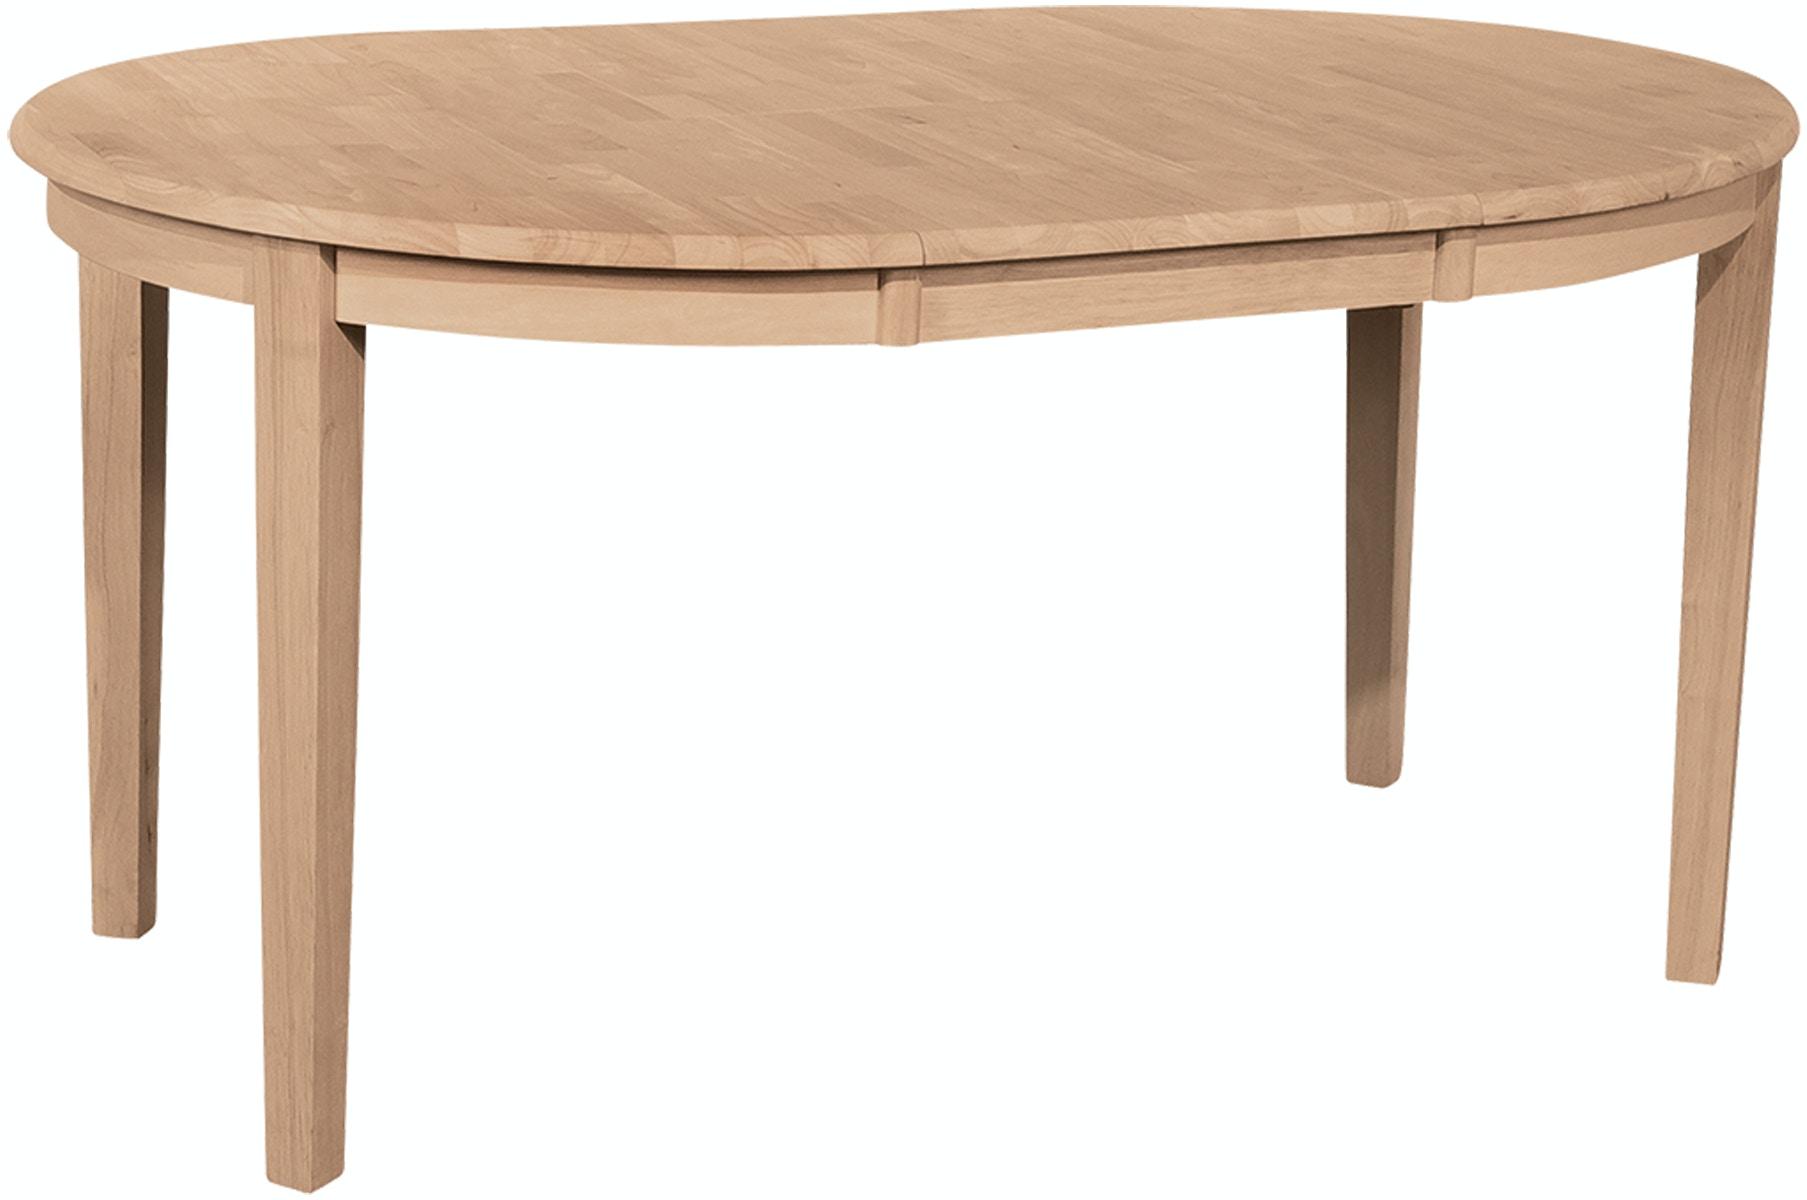 John Thomas Dining Room Contemporary Table T-42RX - Matter ...